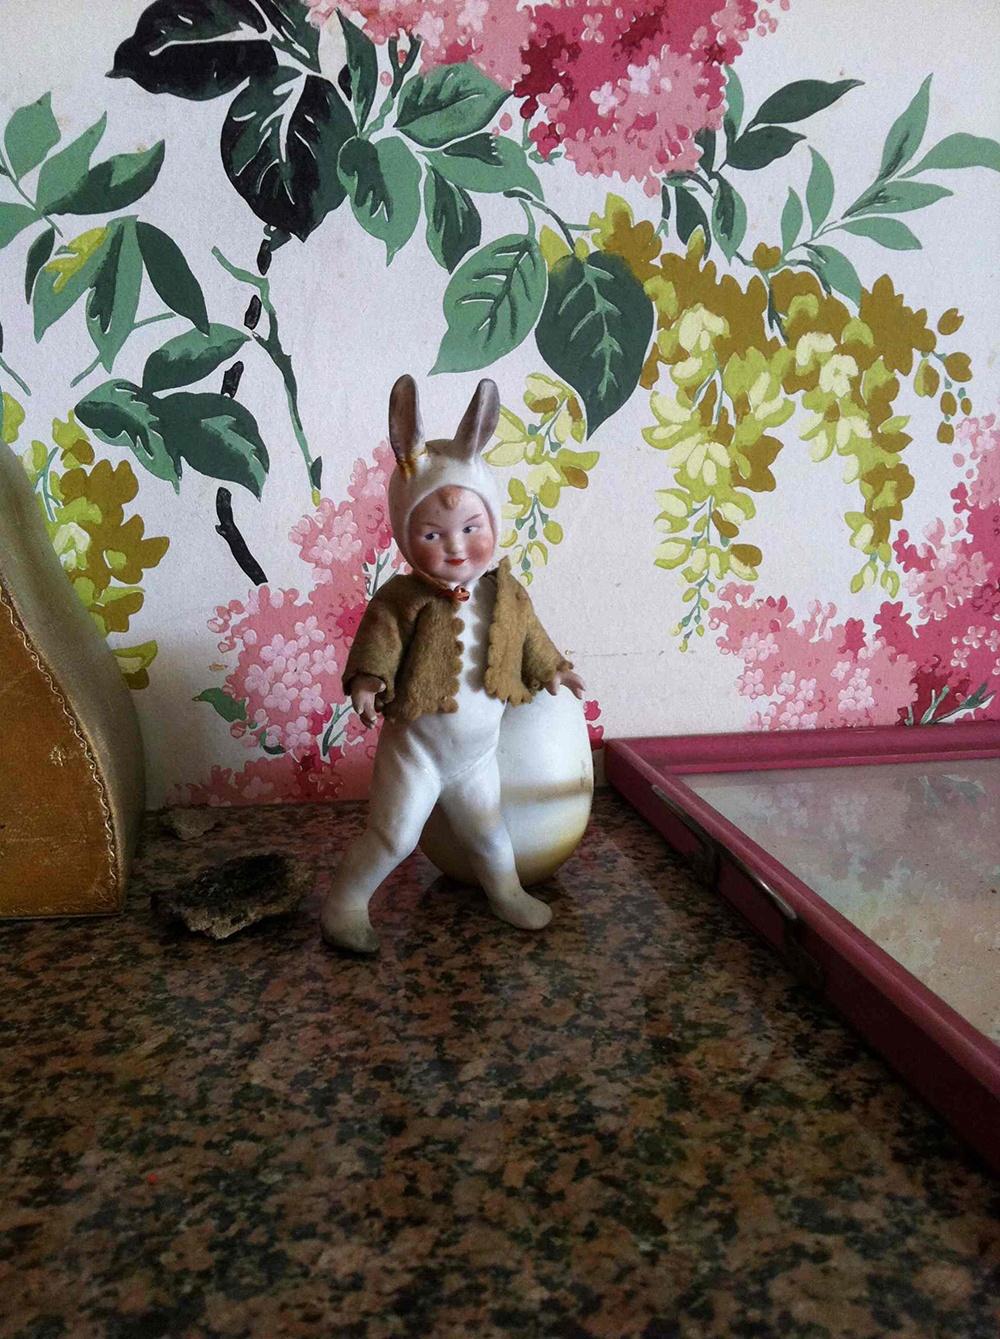 Pretty figurine in the day nursery